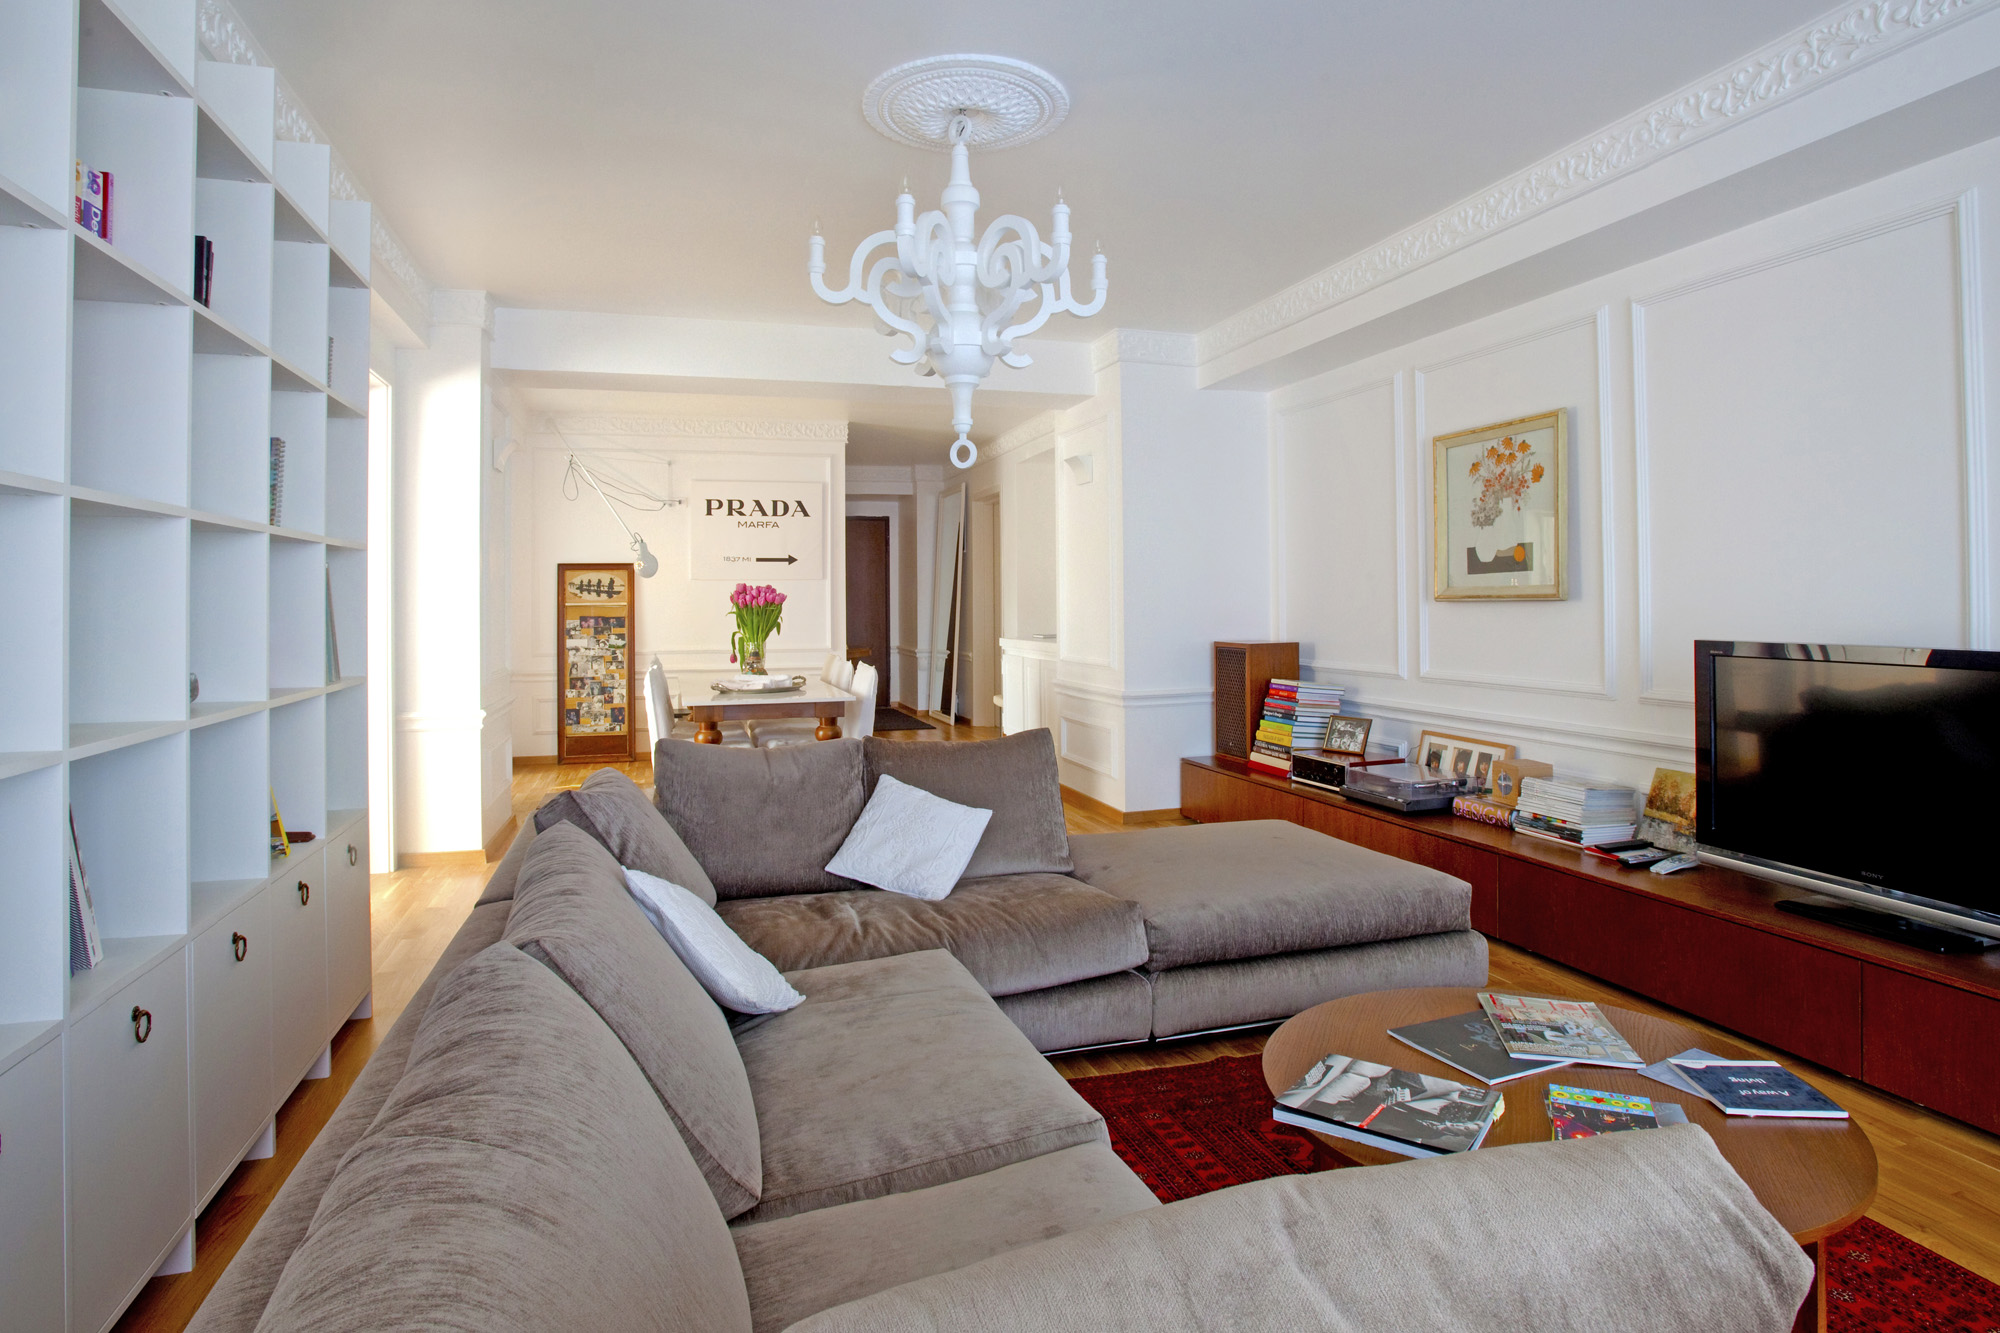 https://ahe-ro.s3.amazonaws.com/12327/apartament-elegant-cu-4-camere-si-terase-generoase-in-centrul-bucurestiului-%281%29.jpg